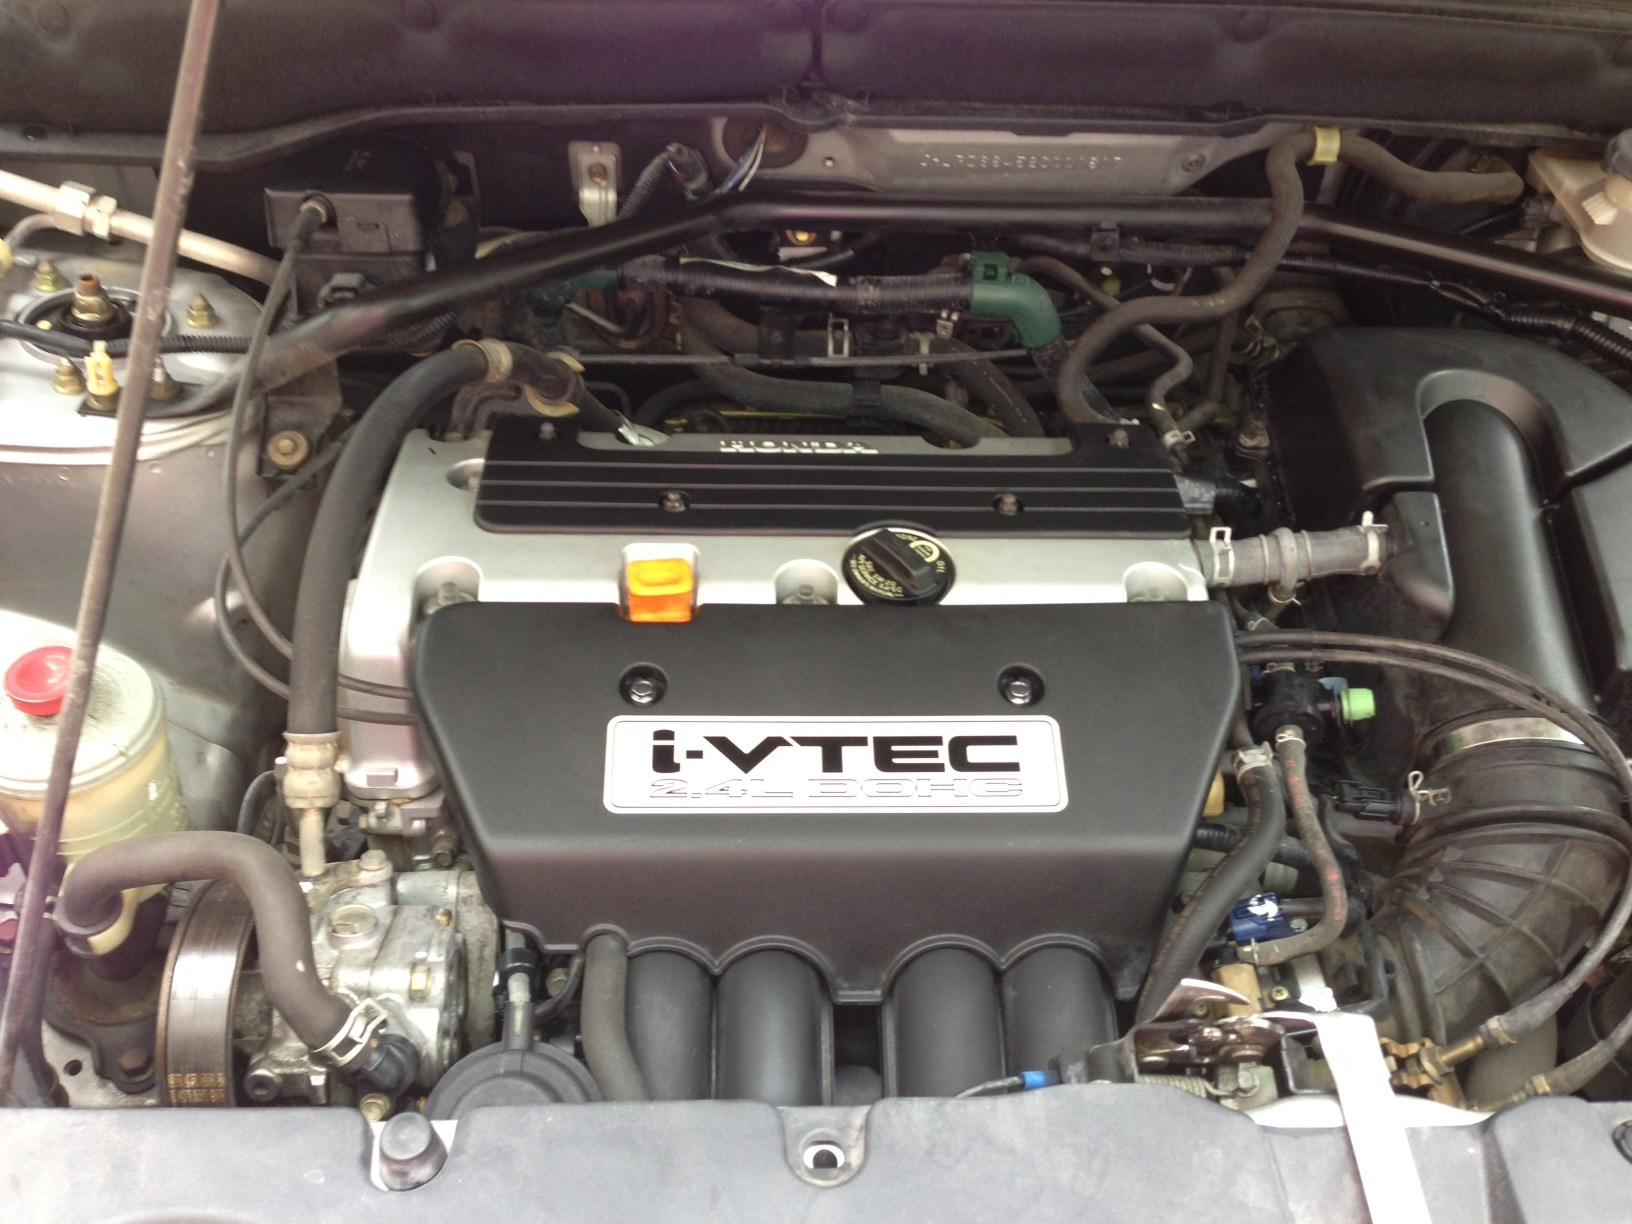 Wondrous 2002 Honda Crv Air Conditioning Repair Classic Cars And Tools Wiring Cloud Grayisramohammedshrineorg